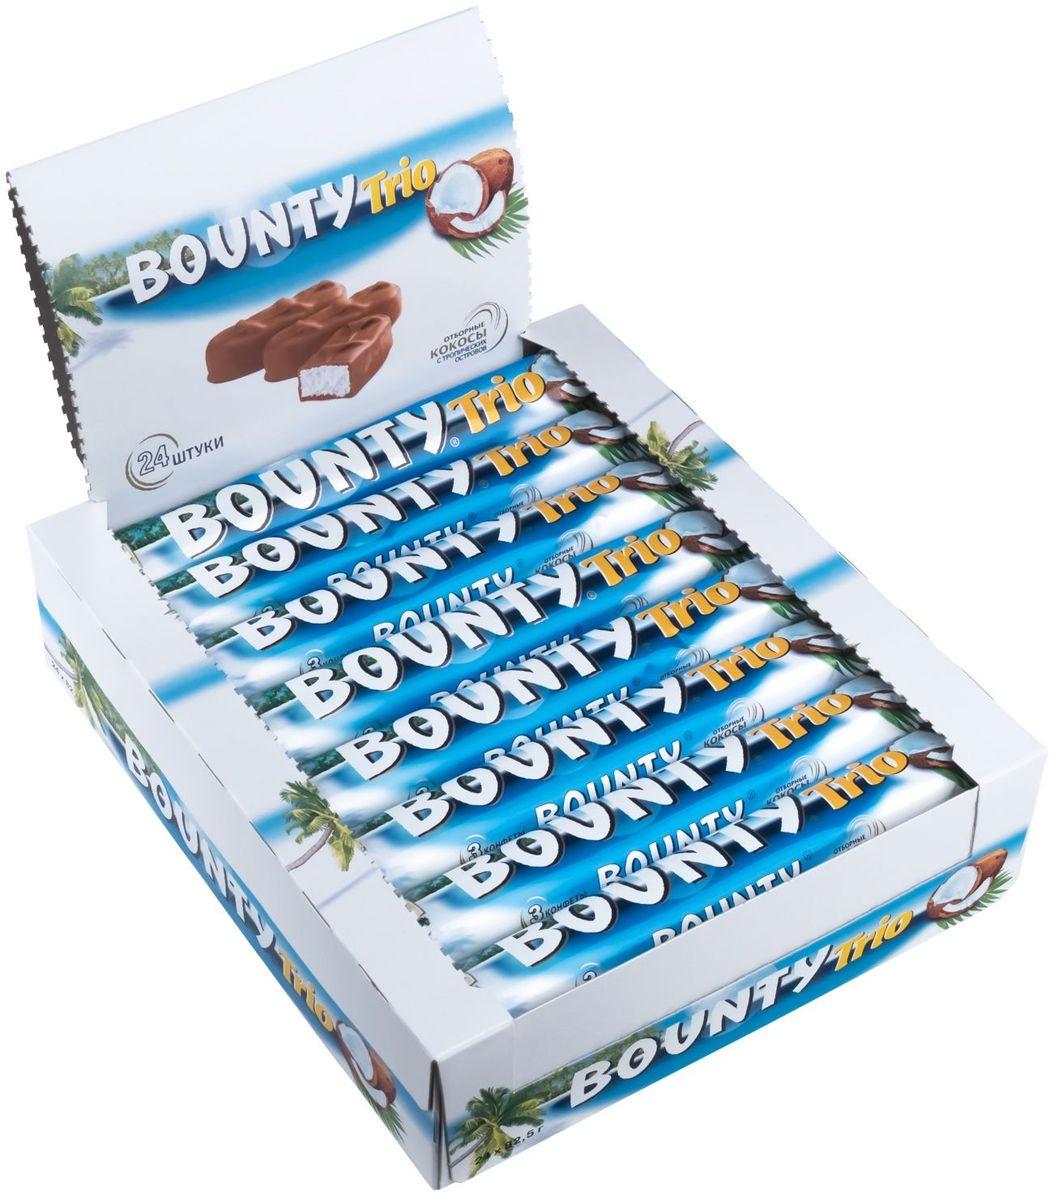 Bounty Trio шоколадный батончик, 24 шт по 82,5 г energon protein шоколадный чизкейк батончик злаковый 60 г